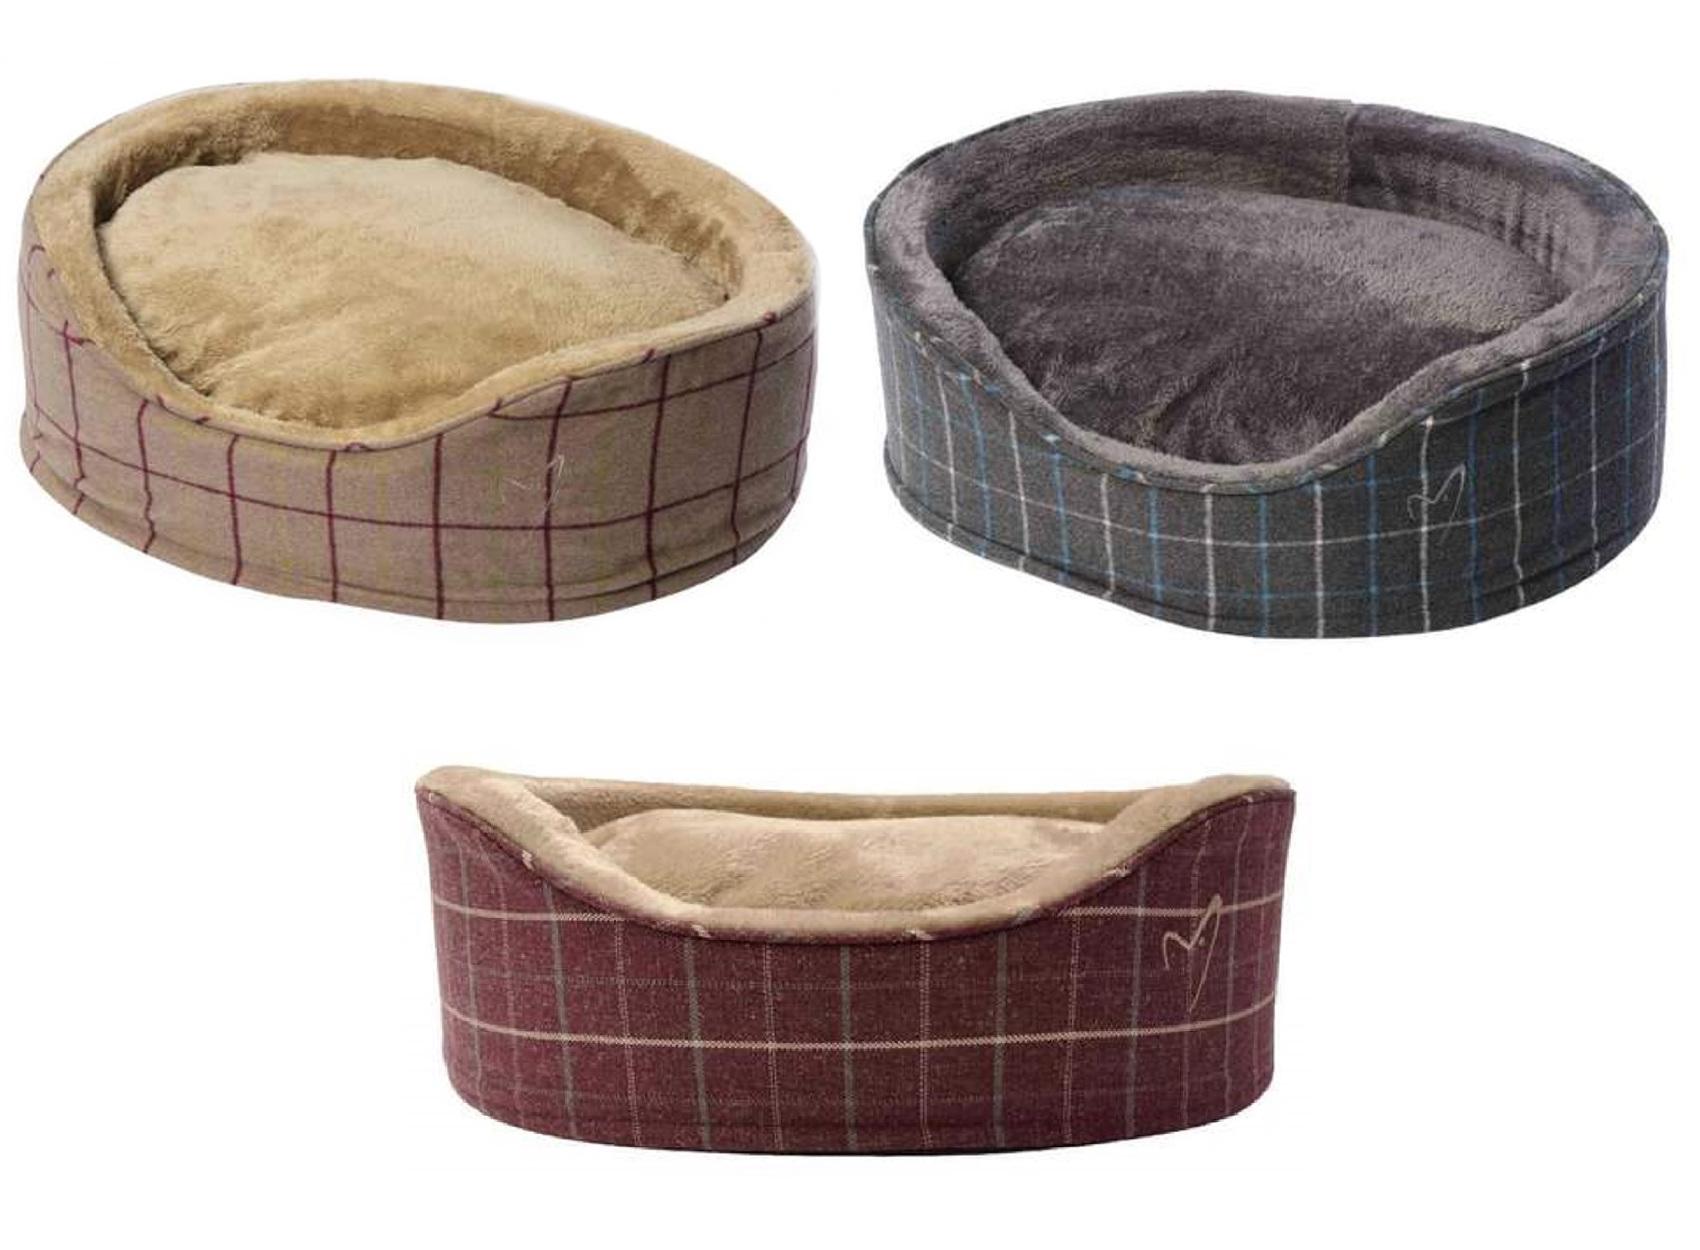 Puppy Dog Oval Basket Gor Pets Premium